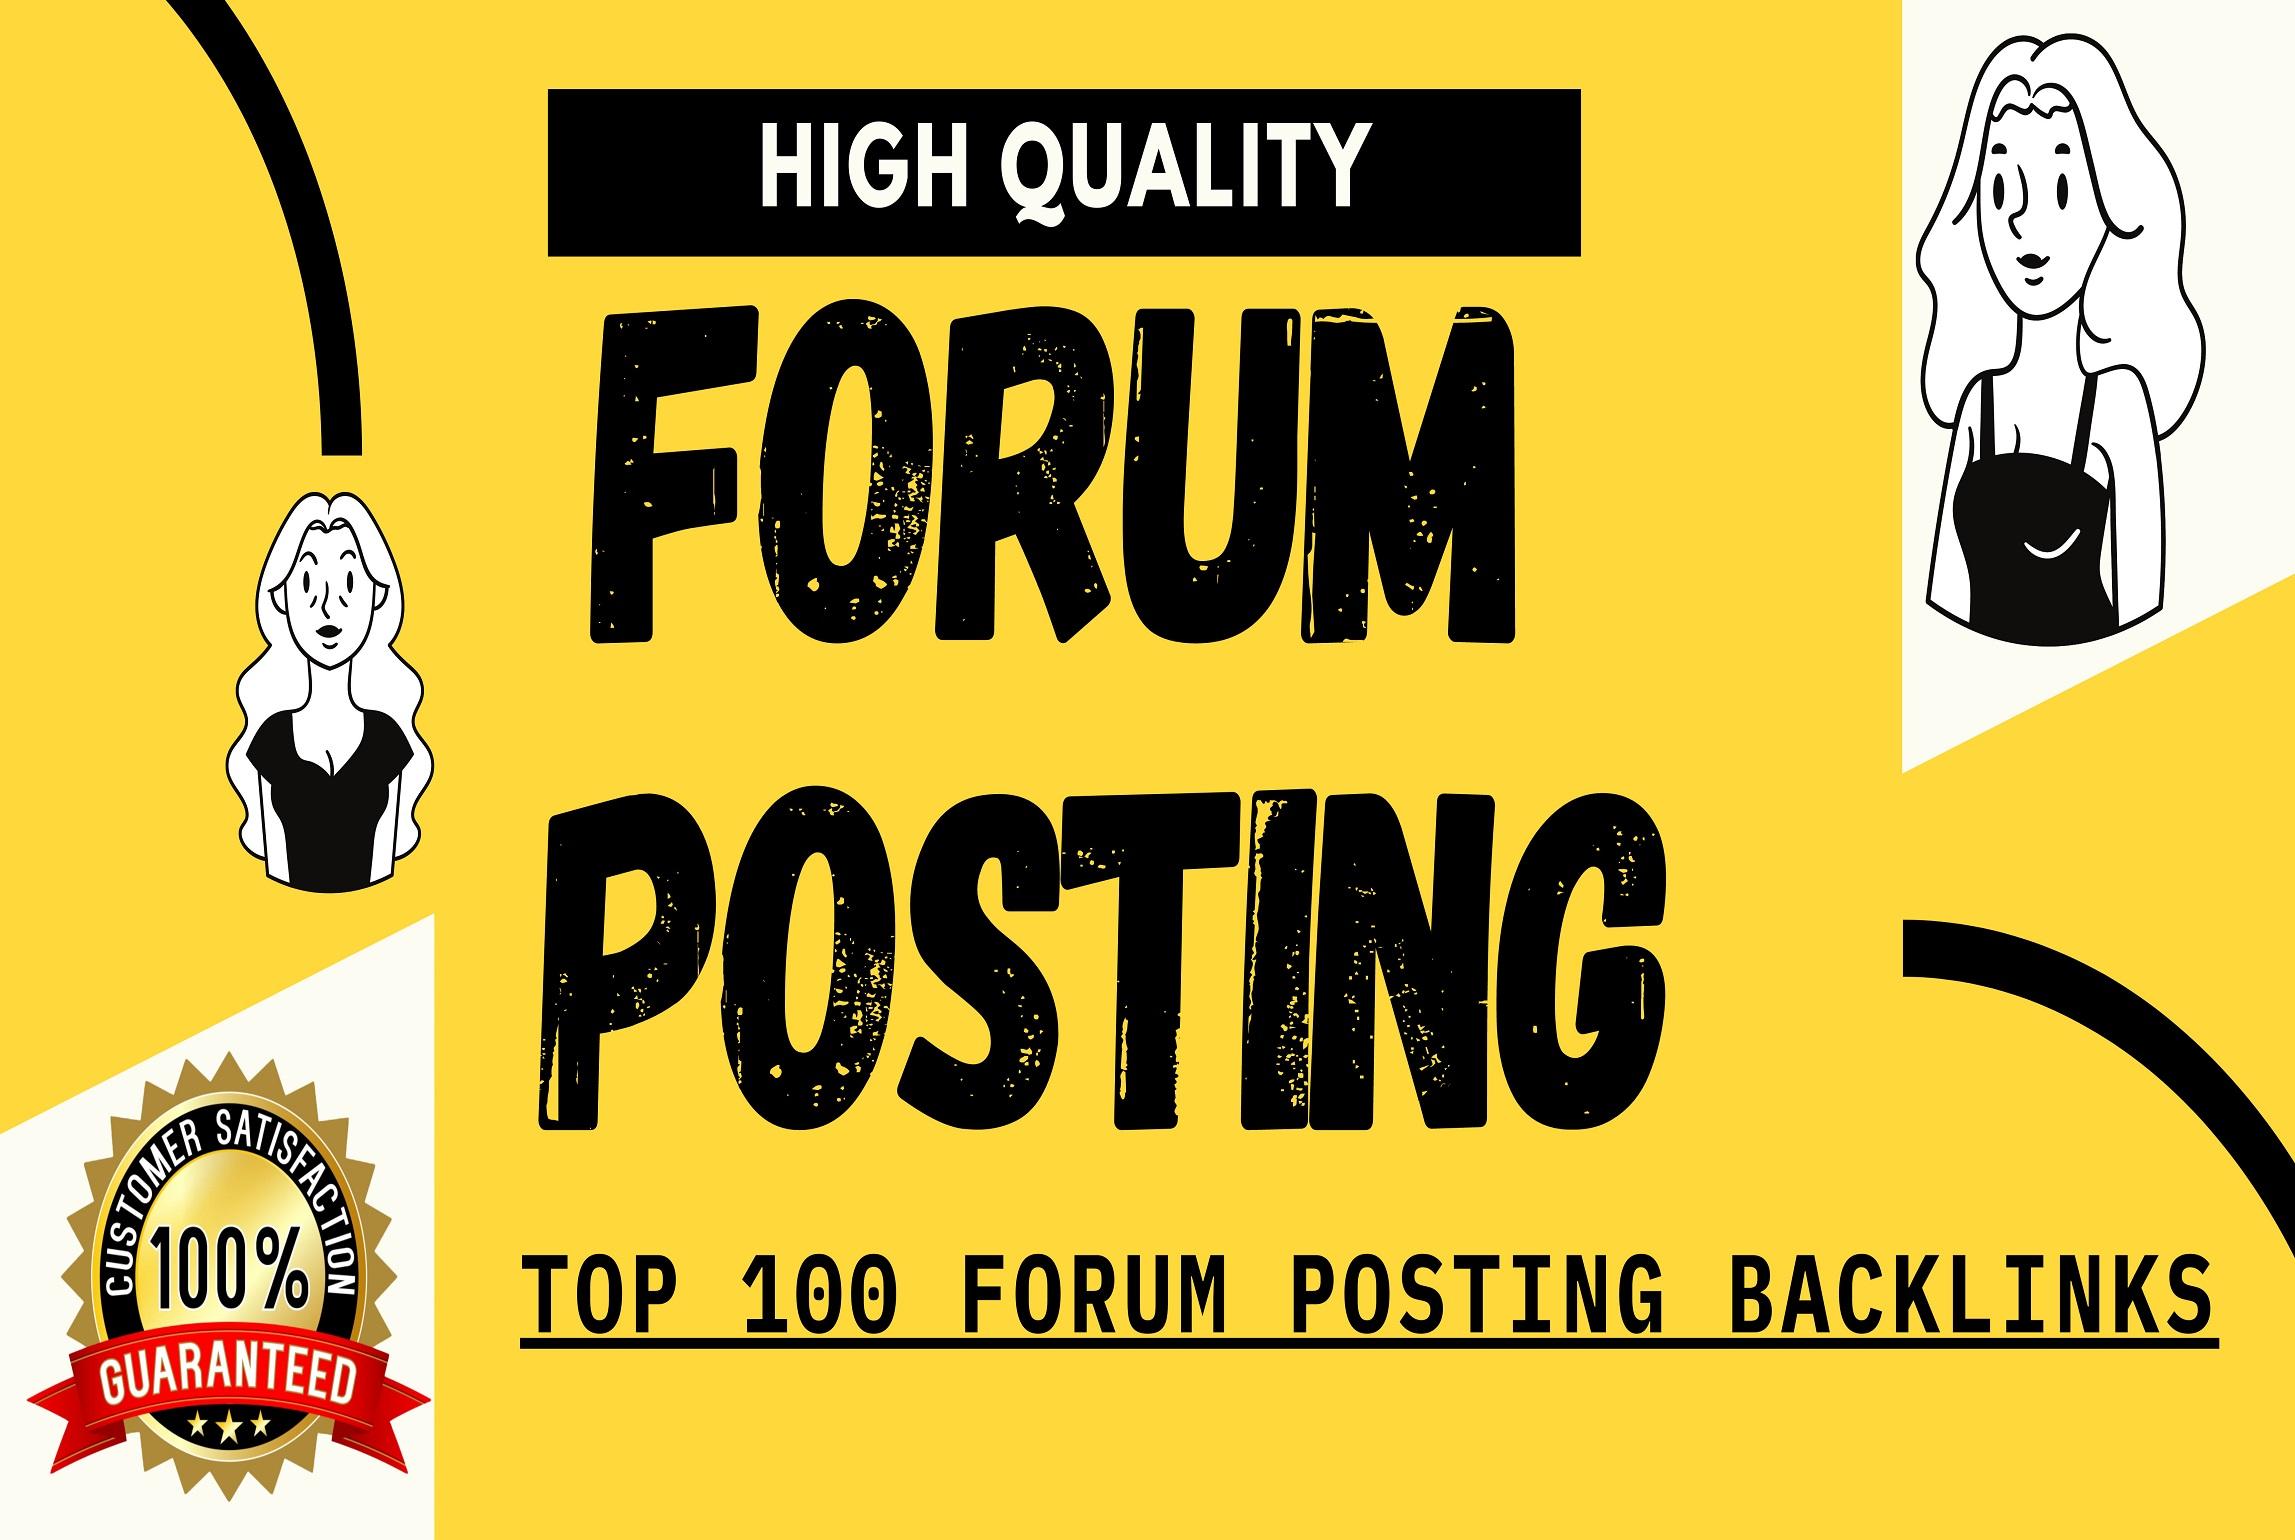 Create 200 manually high authority forum posting backlinks